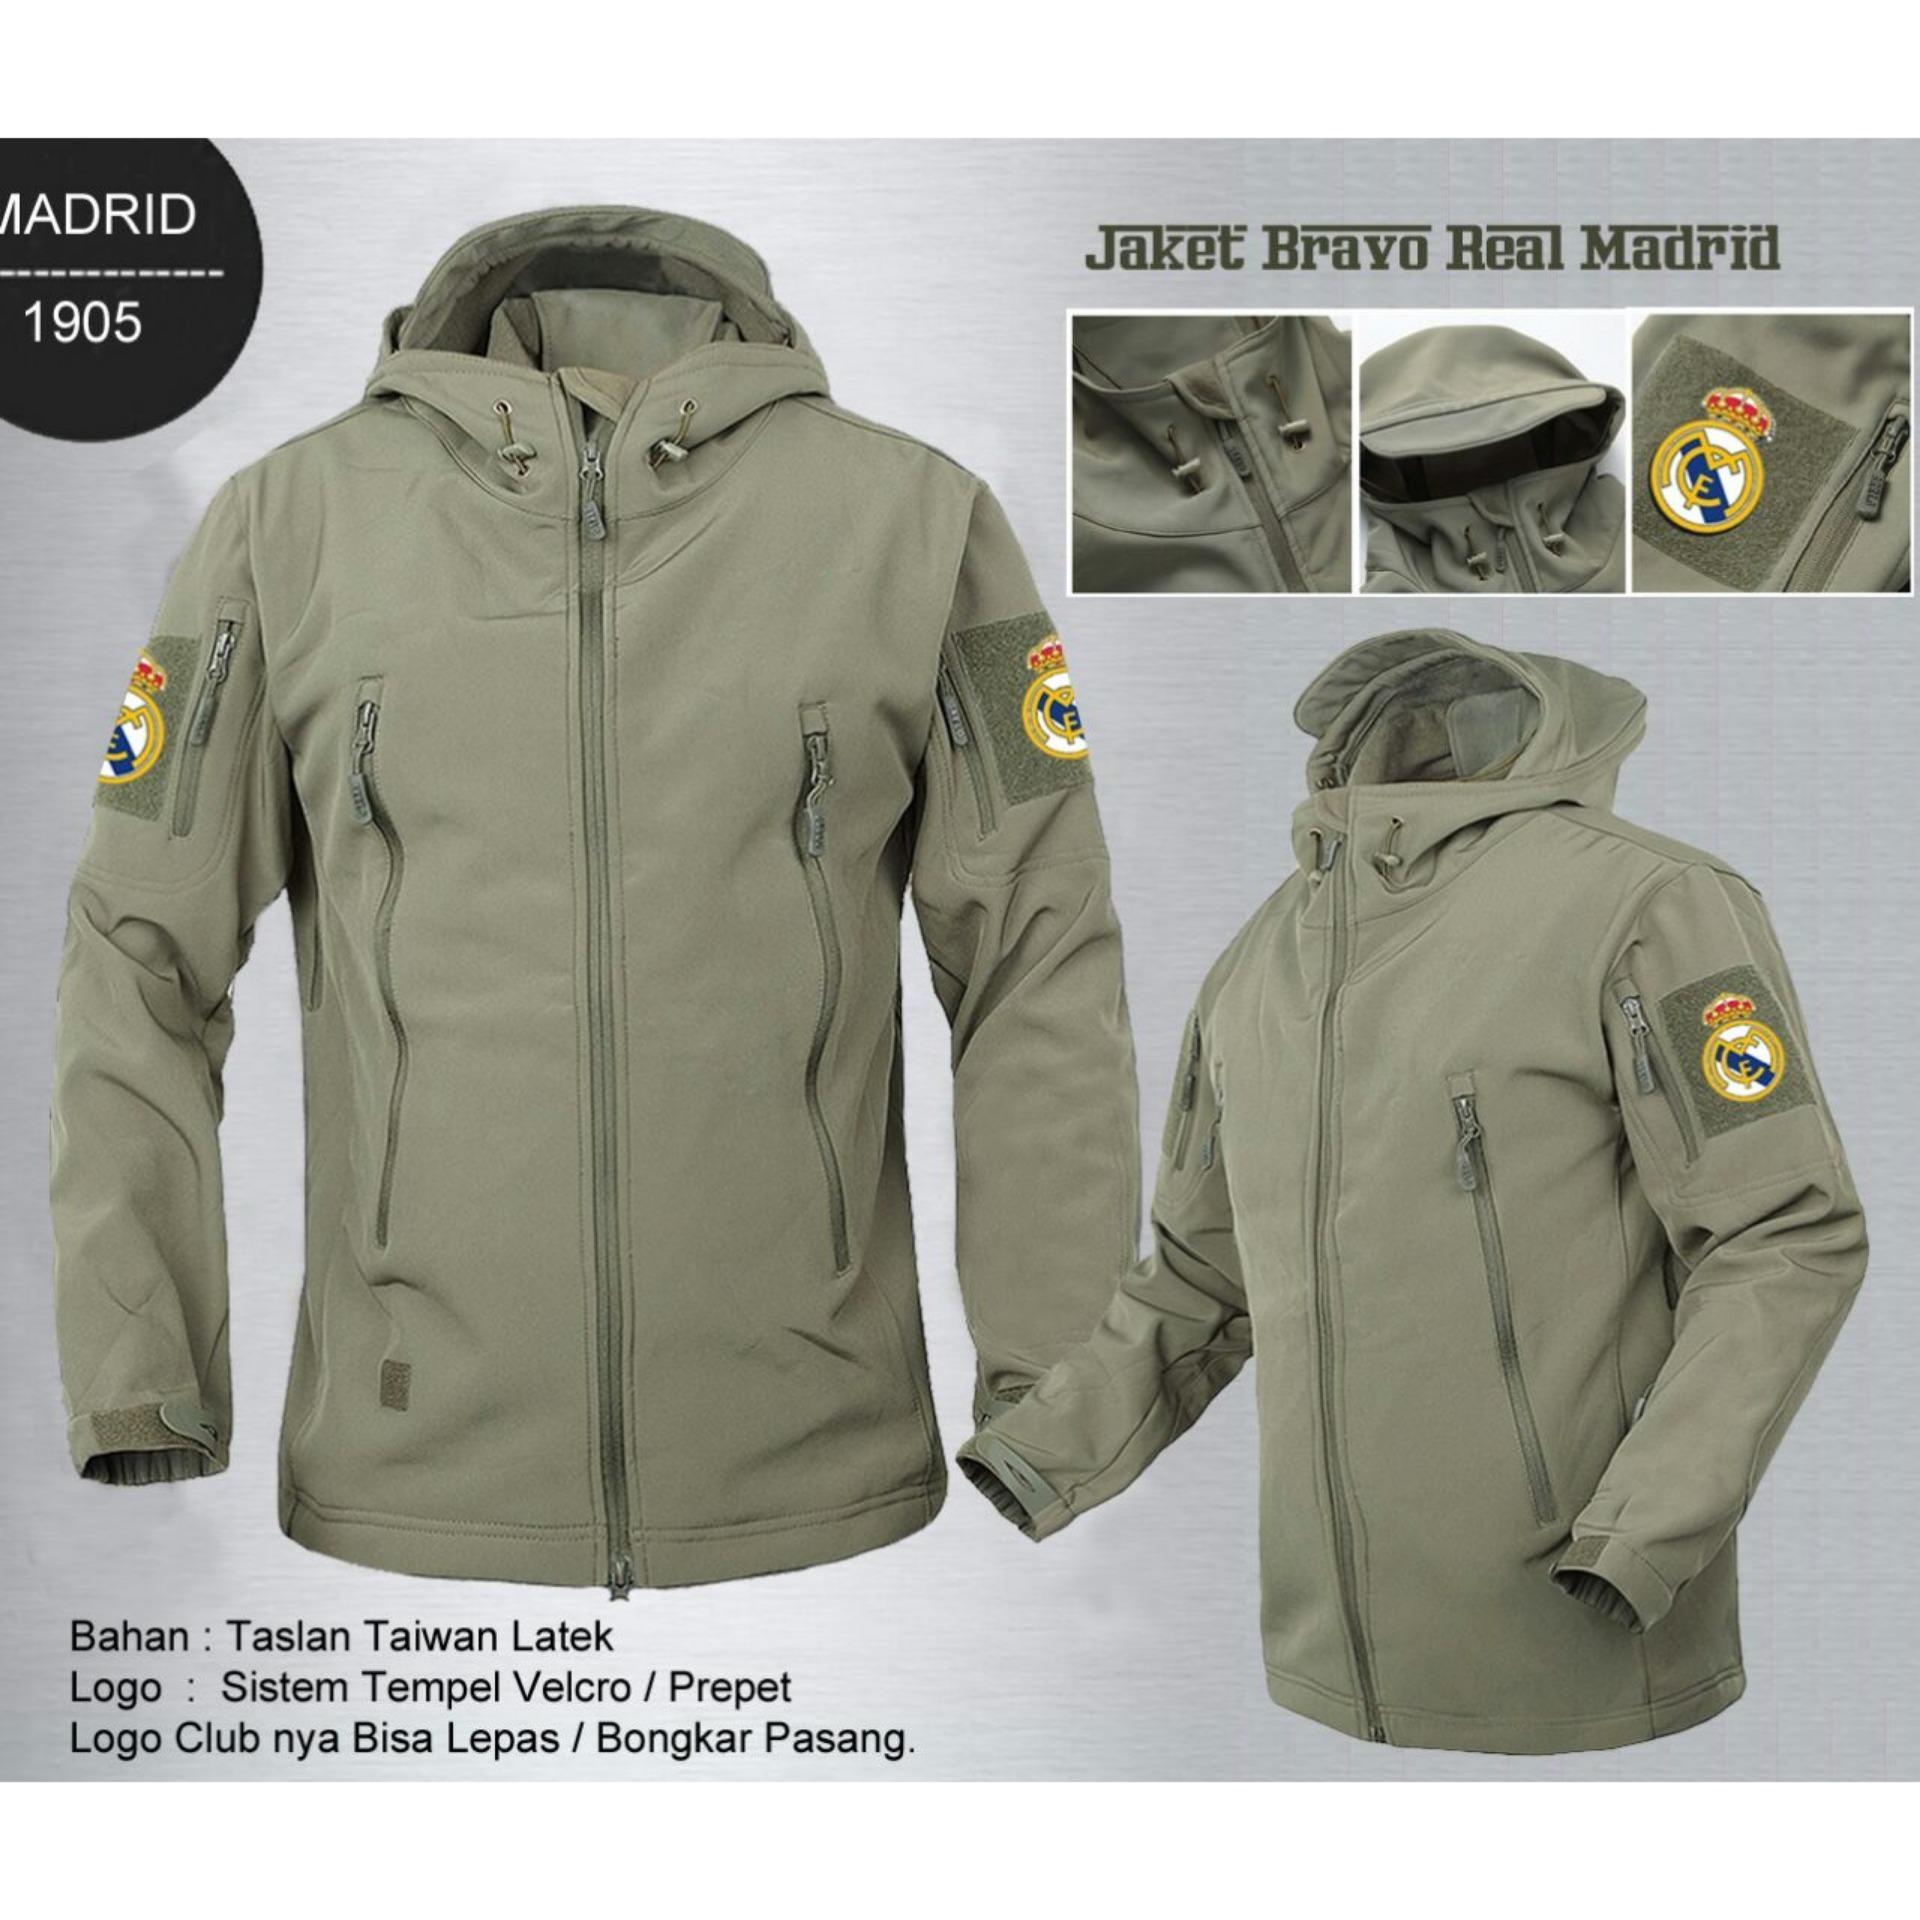 Jaket TAD Bravo Hijau. Promo jaket musim Dingin. Jaket pria jaket gunung  jaket camping ... 64f766d3f4